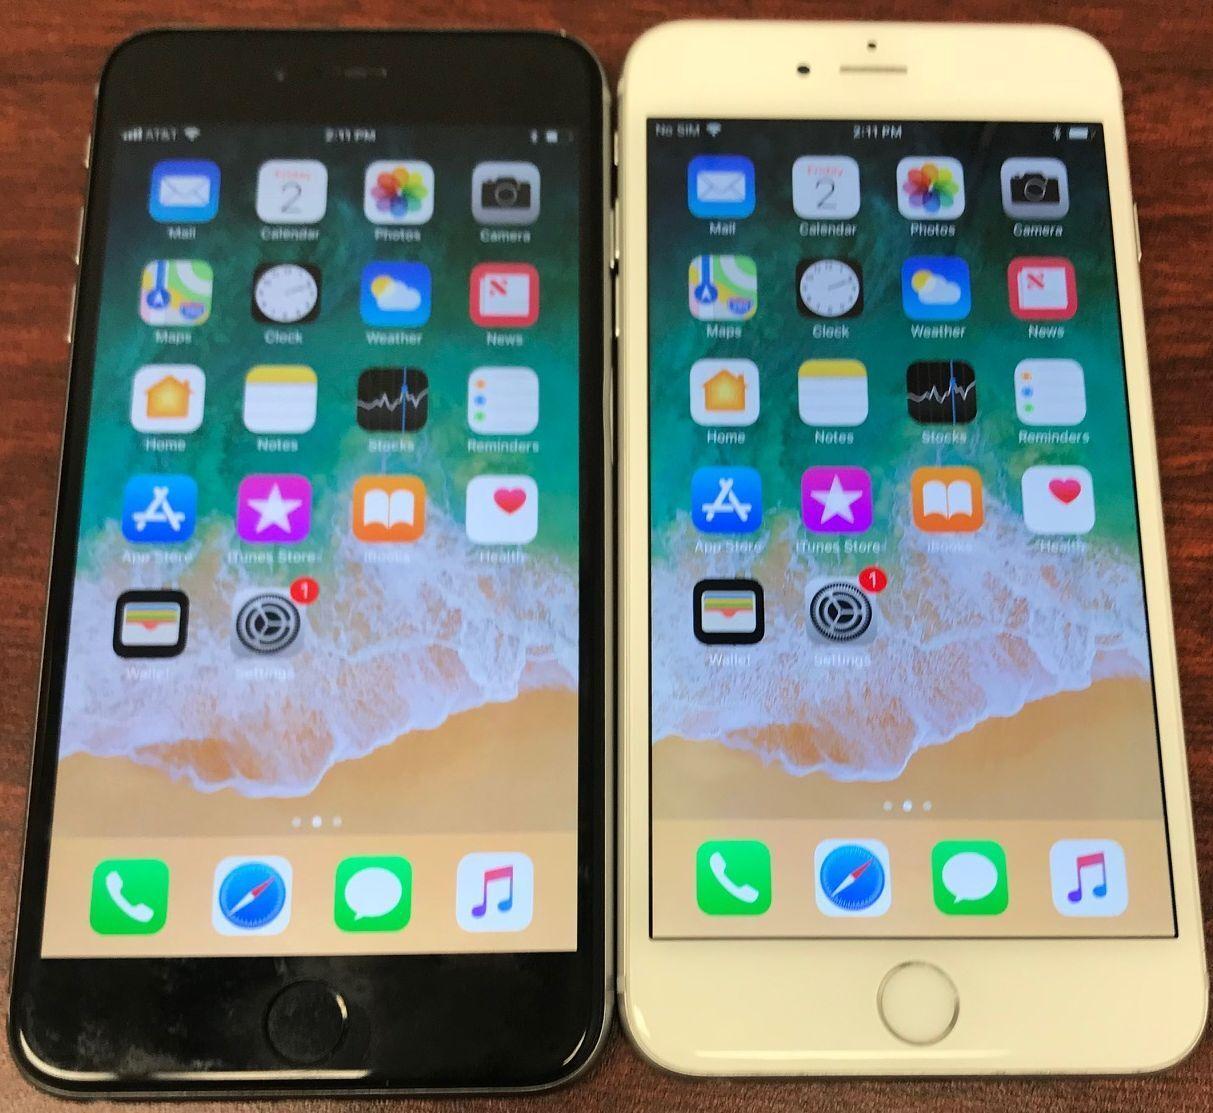 Apple iPhone 6 Plus 64GB AT&T Factory Unlocked GSM Smartphone